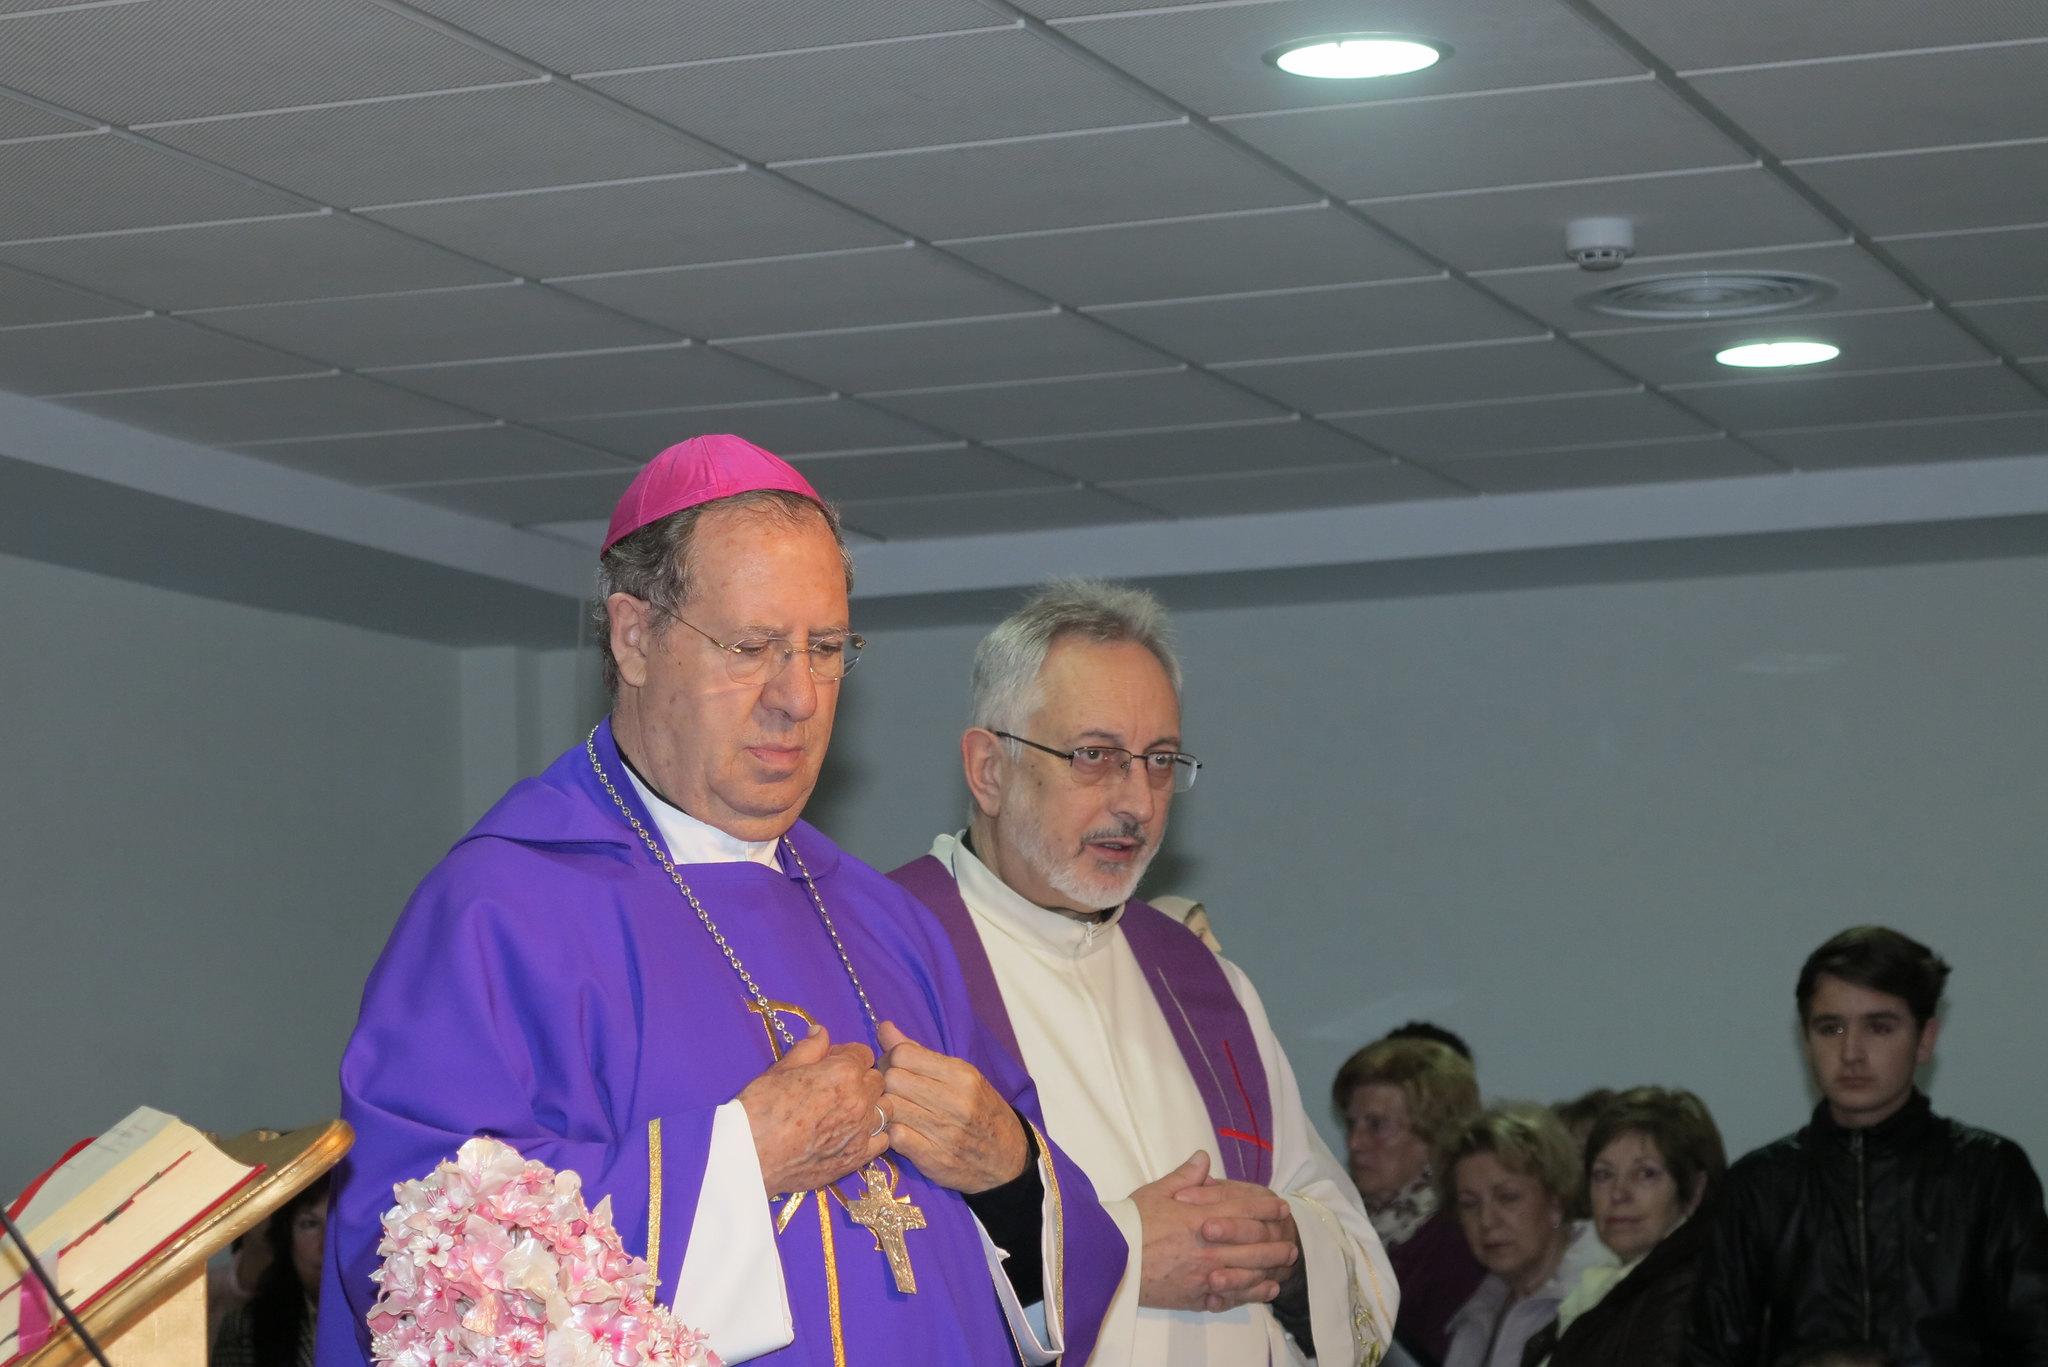 (2016-02-13) - Inauguración Virgen de Lourdes, La Molineta - Archivo La Molineta 2 (23)